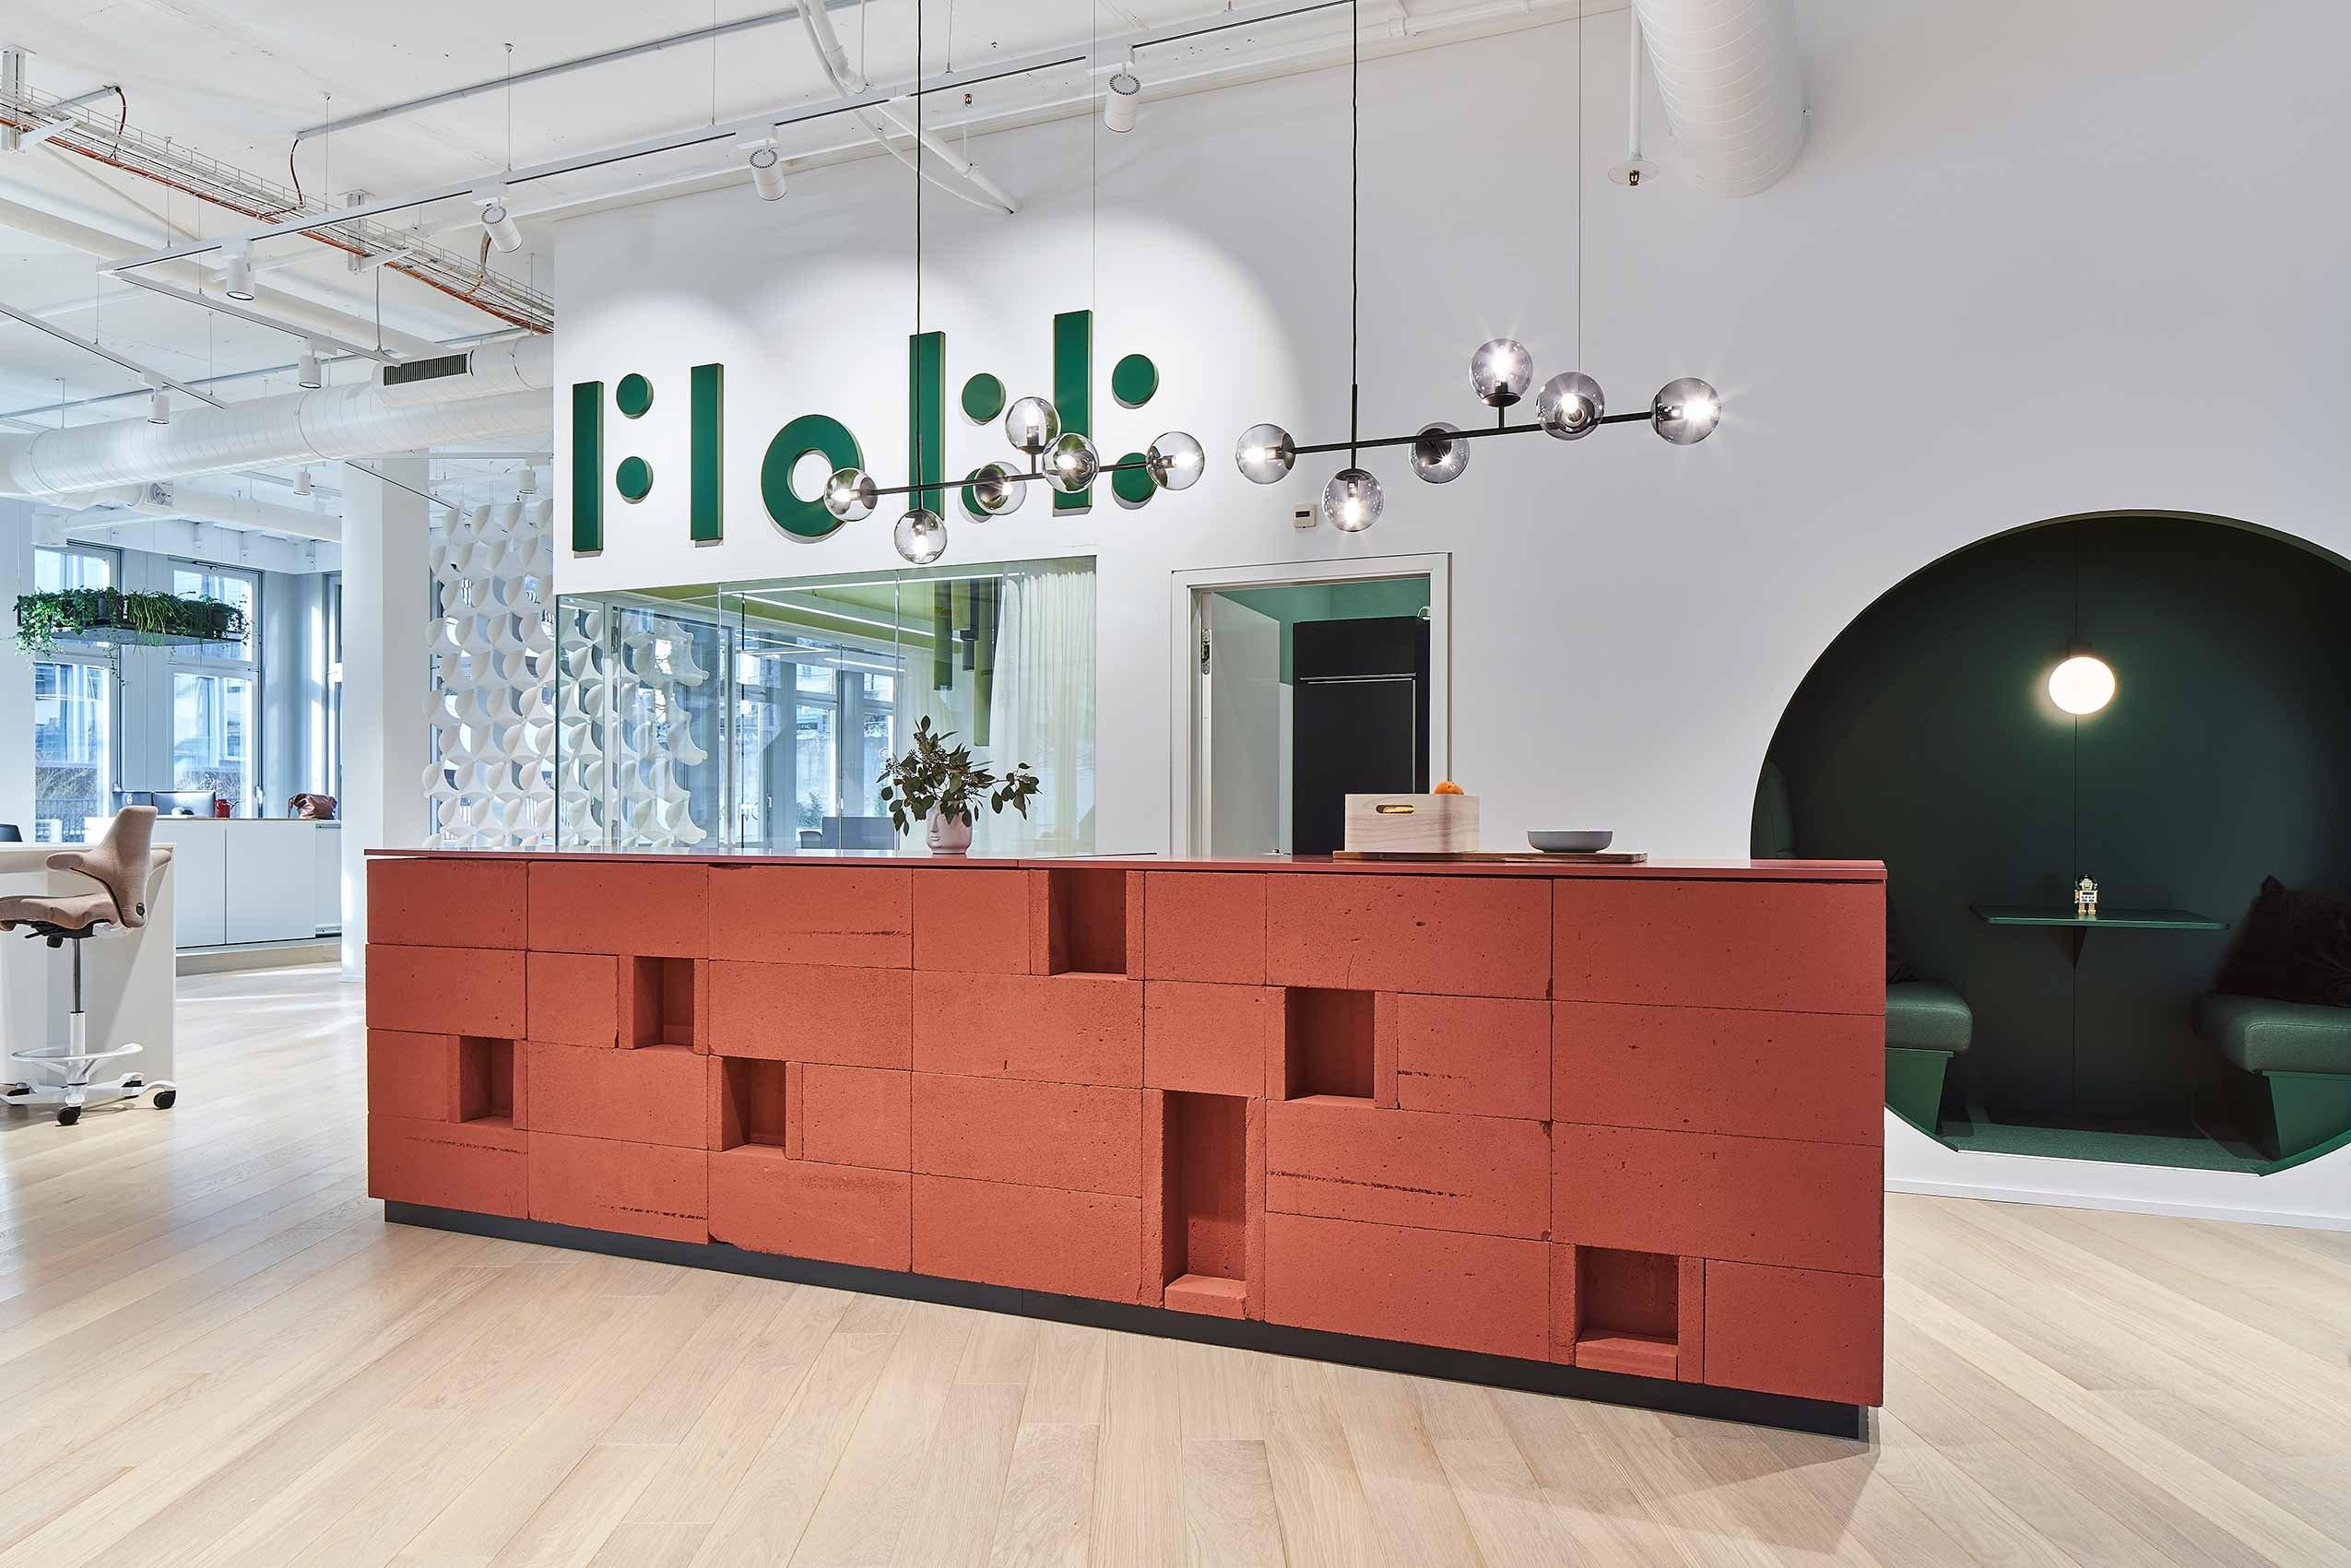 Flokk_Store_Glattpark_Final_009_resize